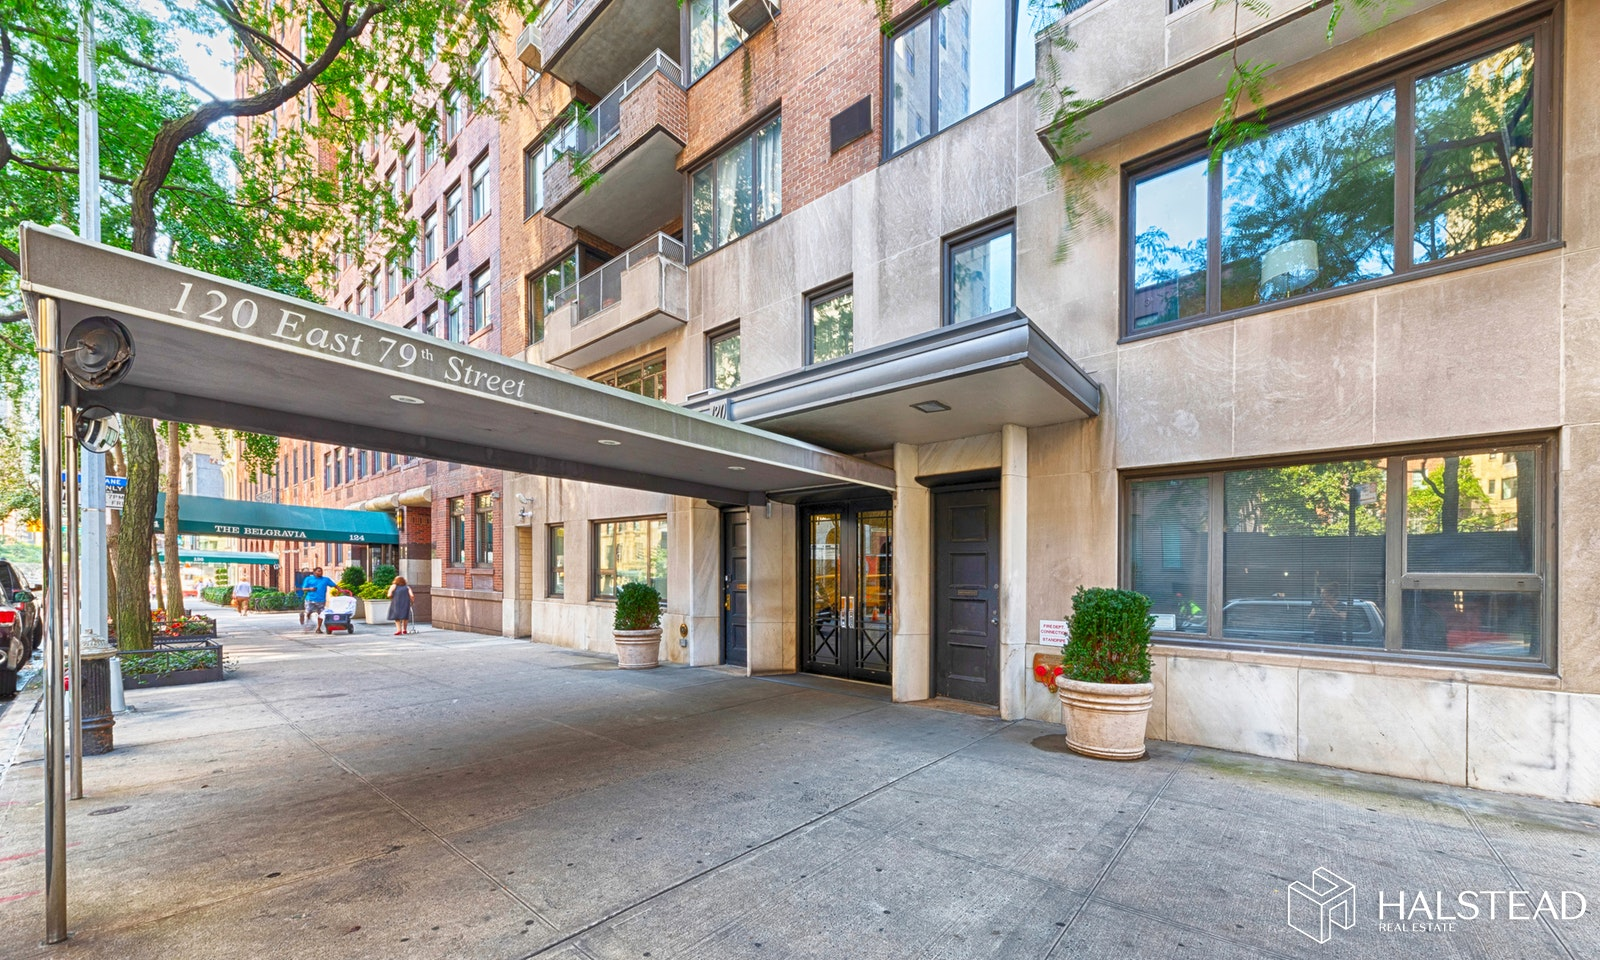 120 EAST 79TH STREET 2B, Upper East Side, $649,000, Web #: 19877357